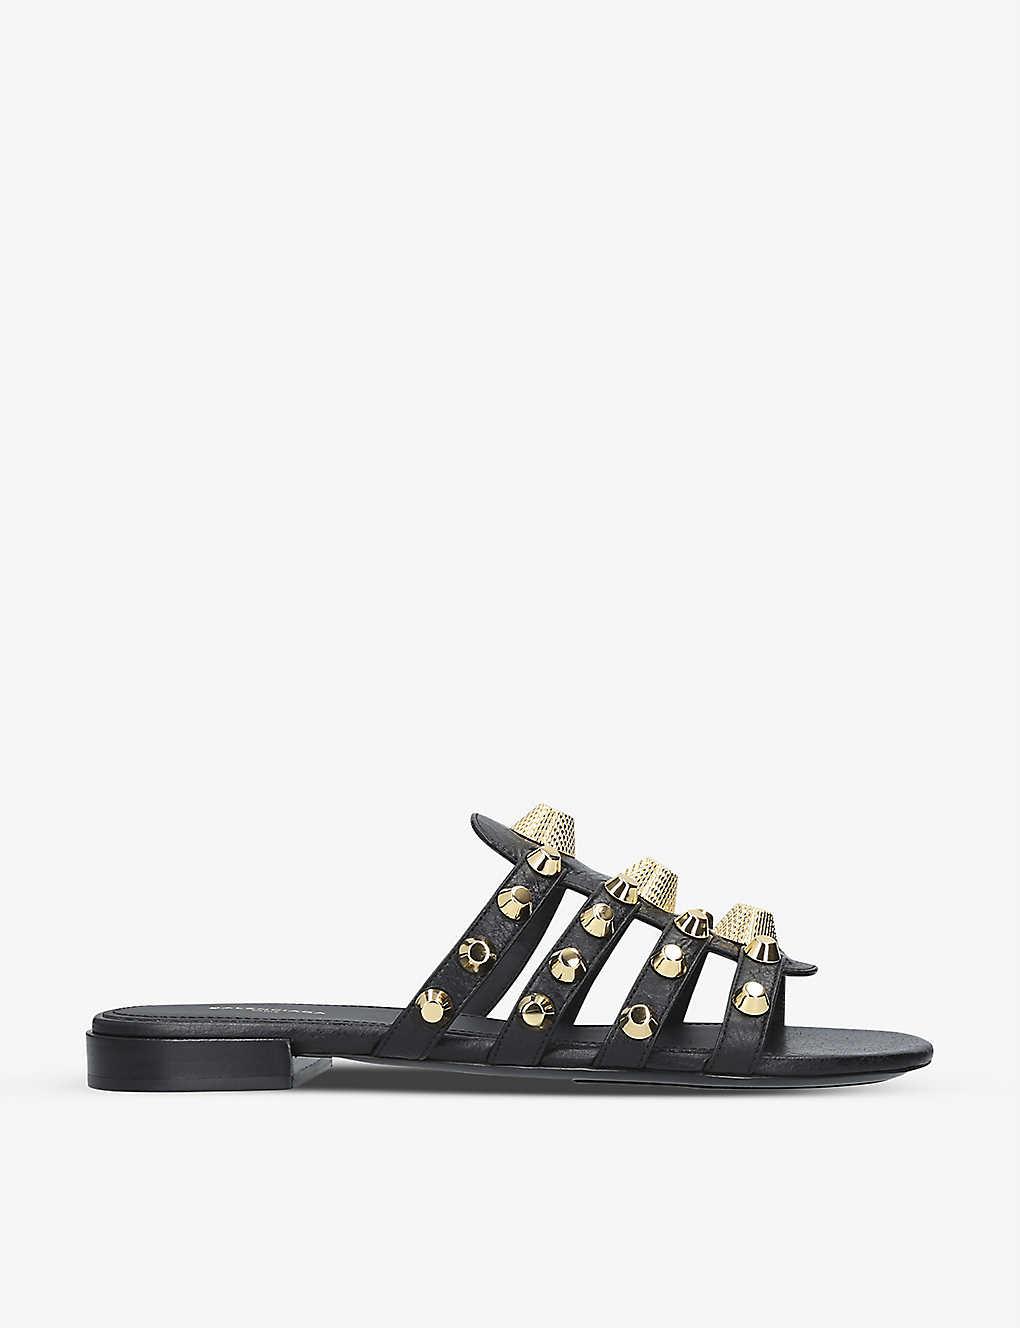 Balenciaga Sandals Gwen leather sandals